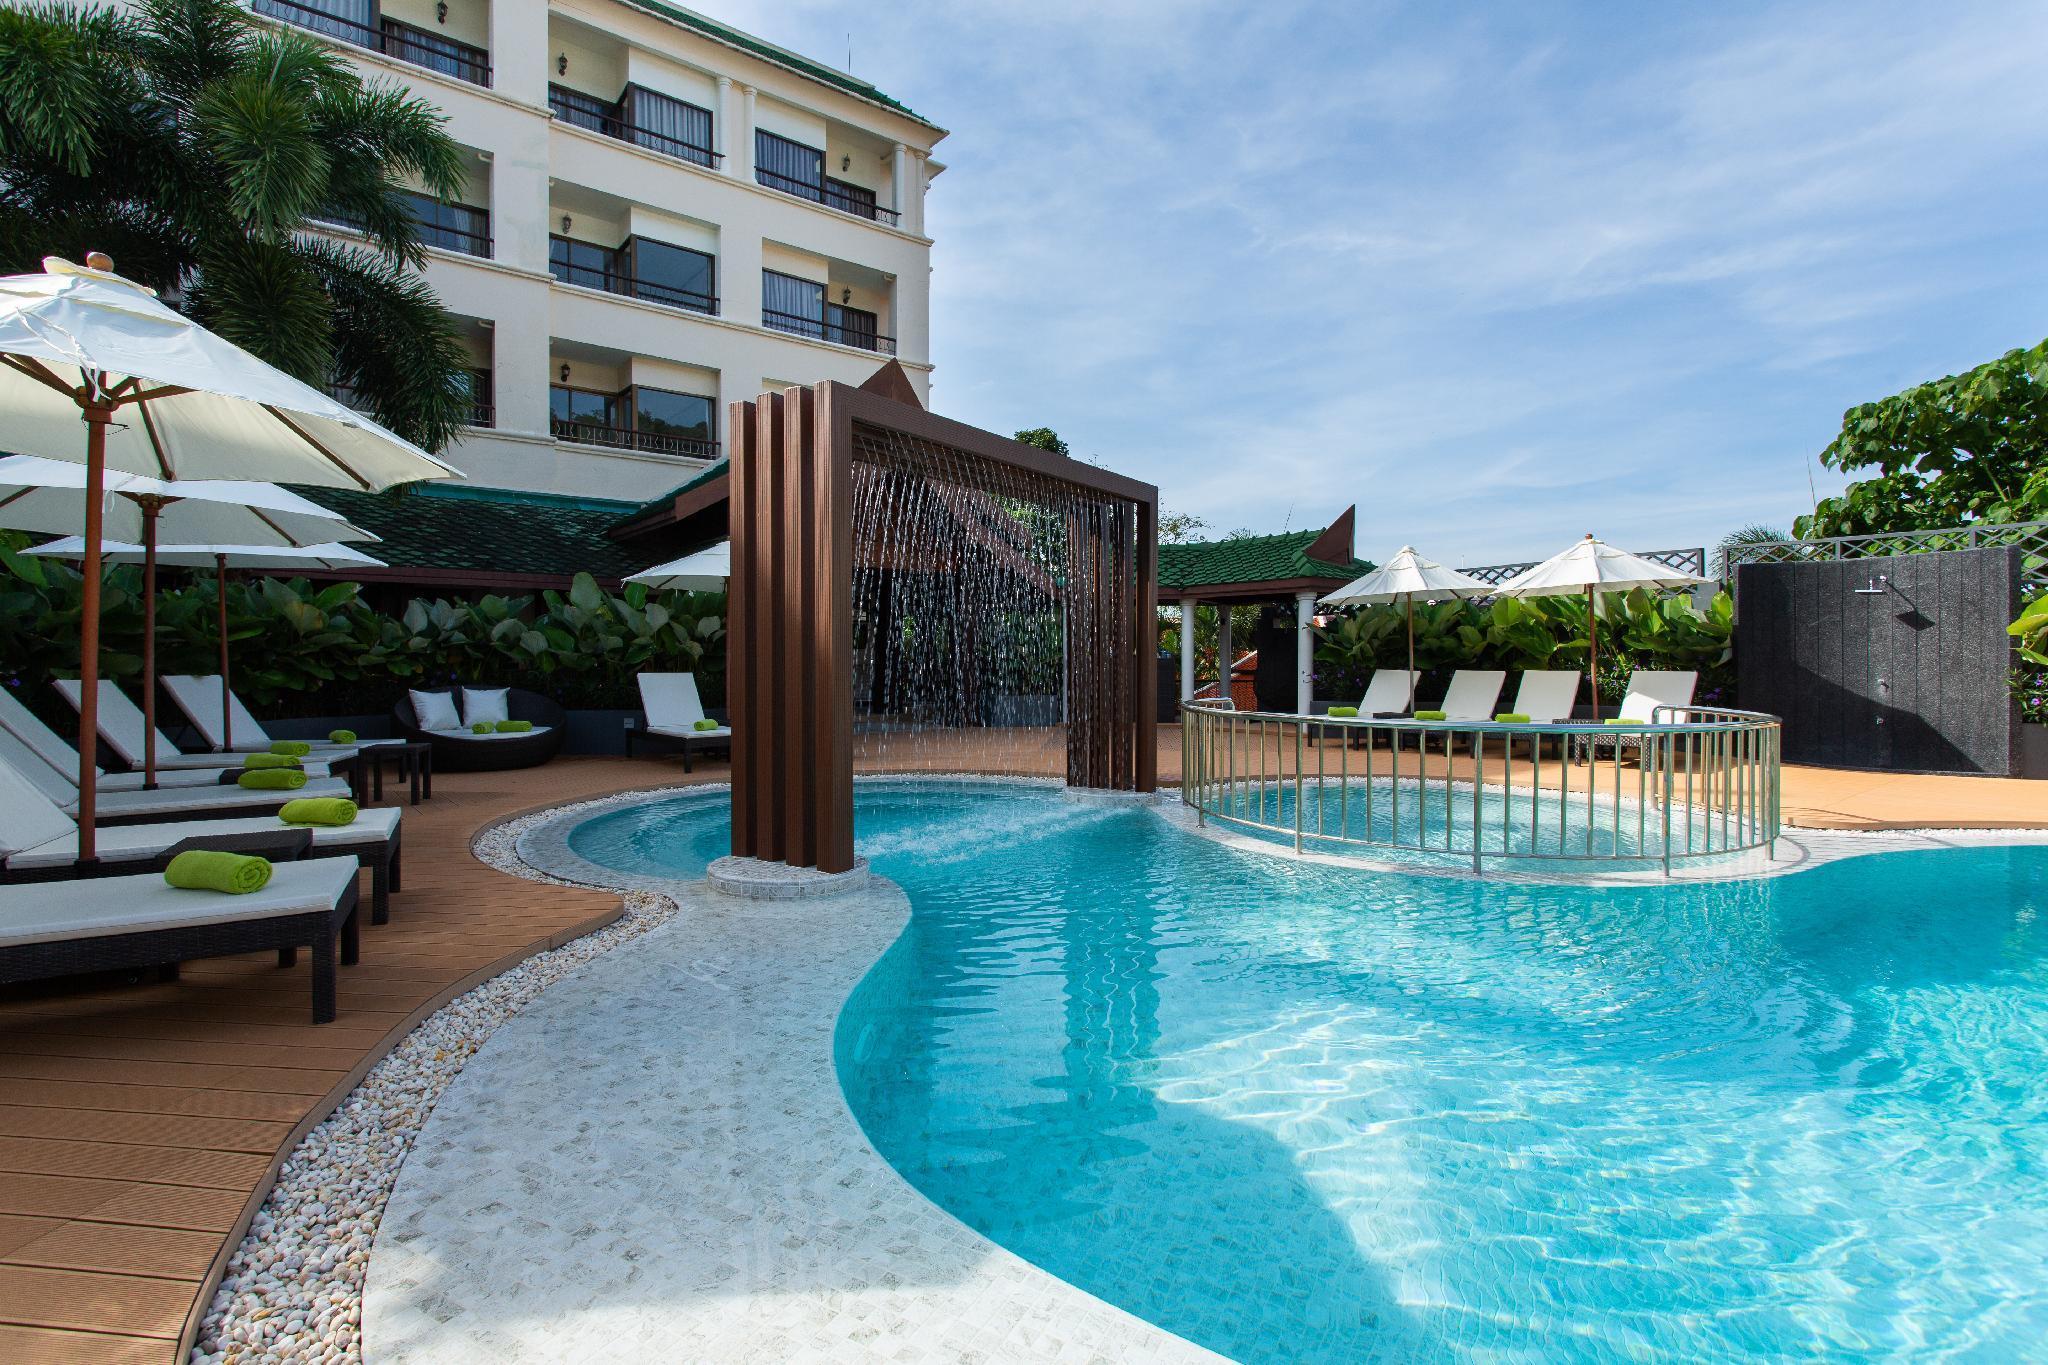 Krabi Heritage Hotel กระบี่เฮอริเทจ โฮเทล